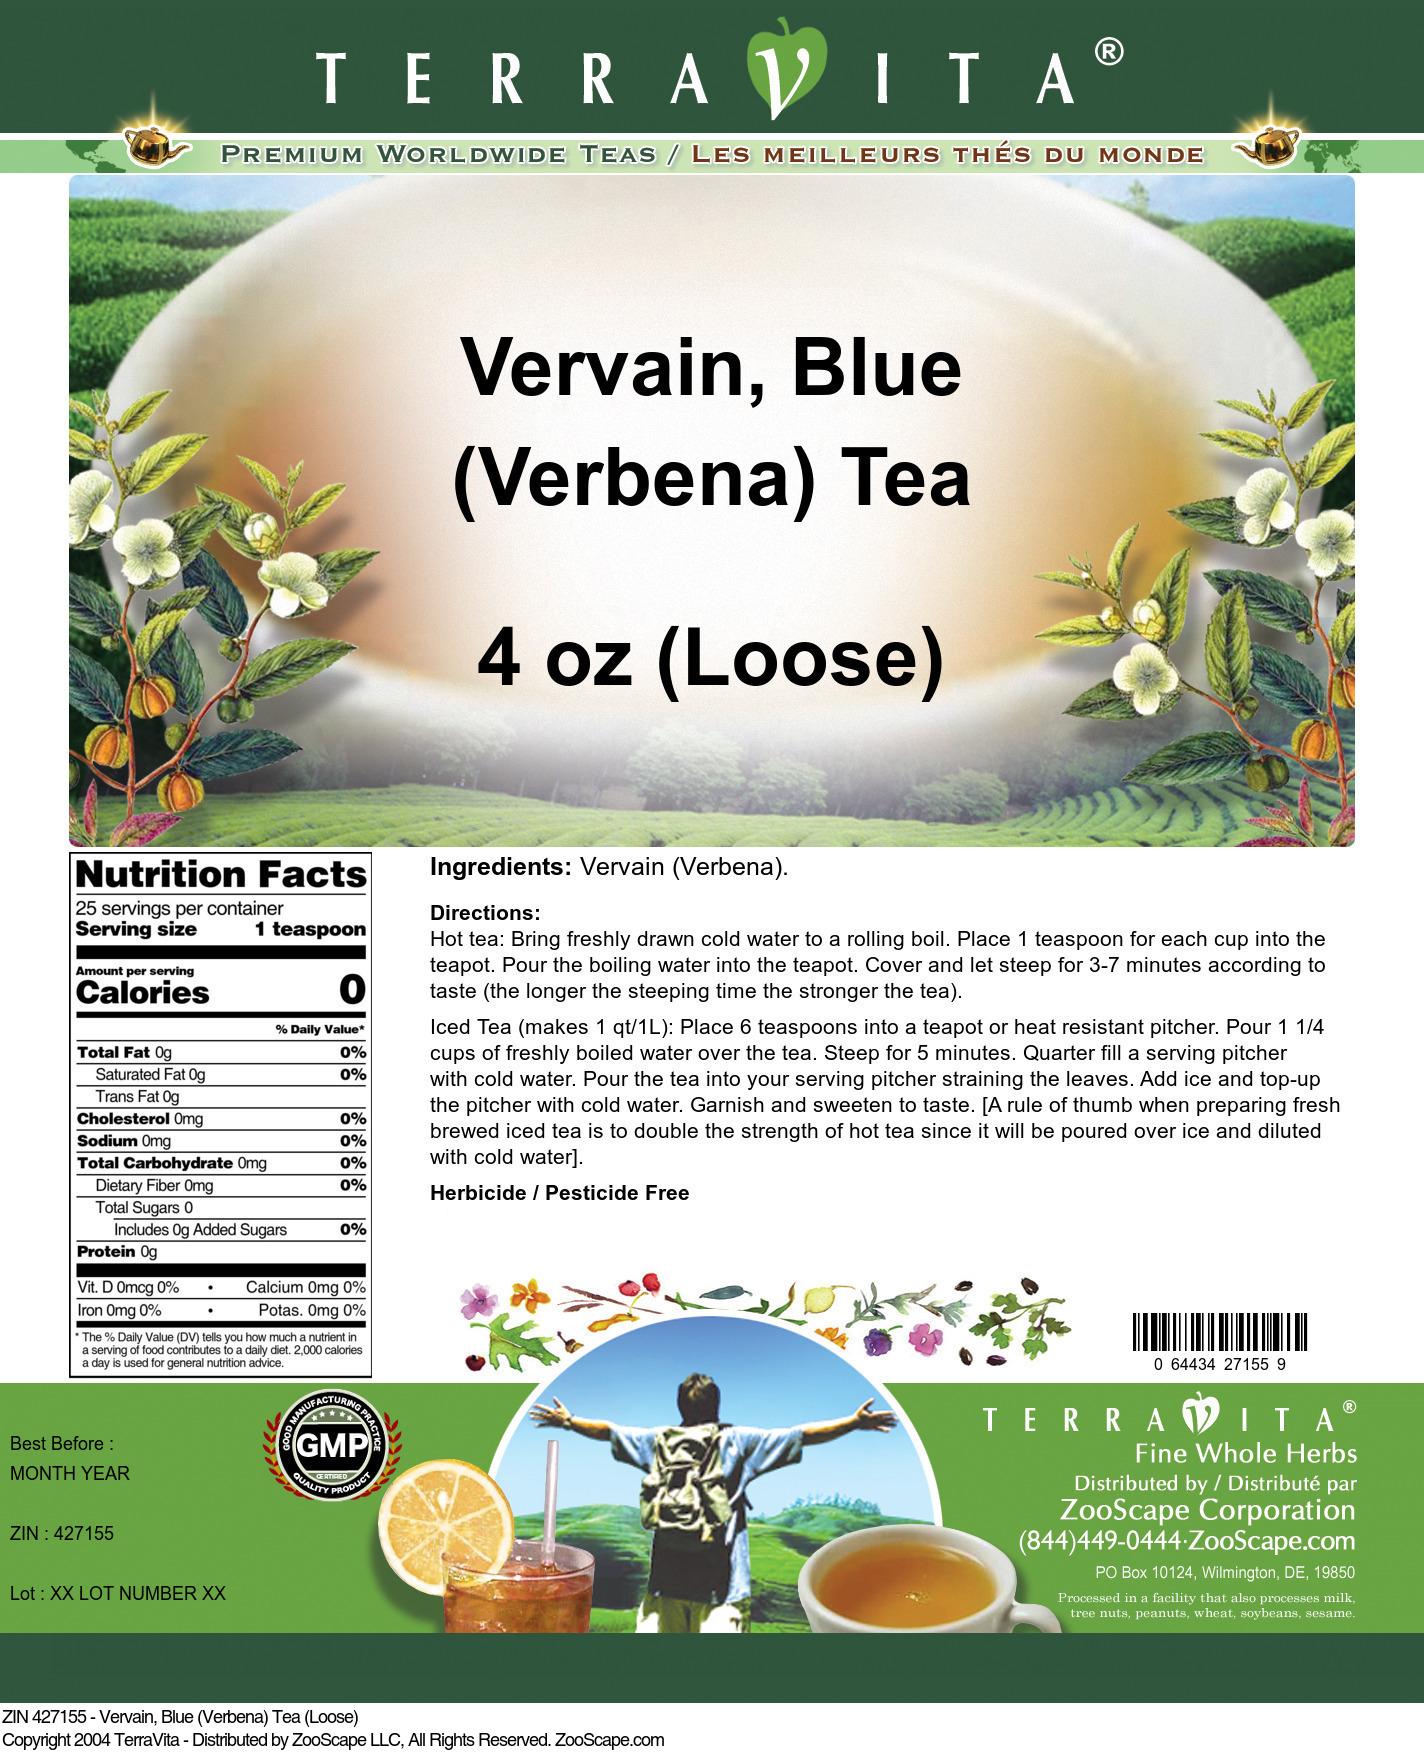 Vervain, Blue (Verbena) Tea (Loose) - Label